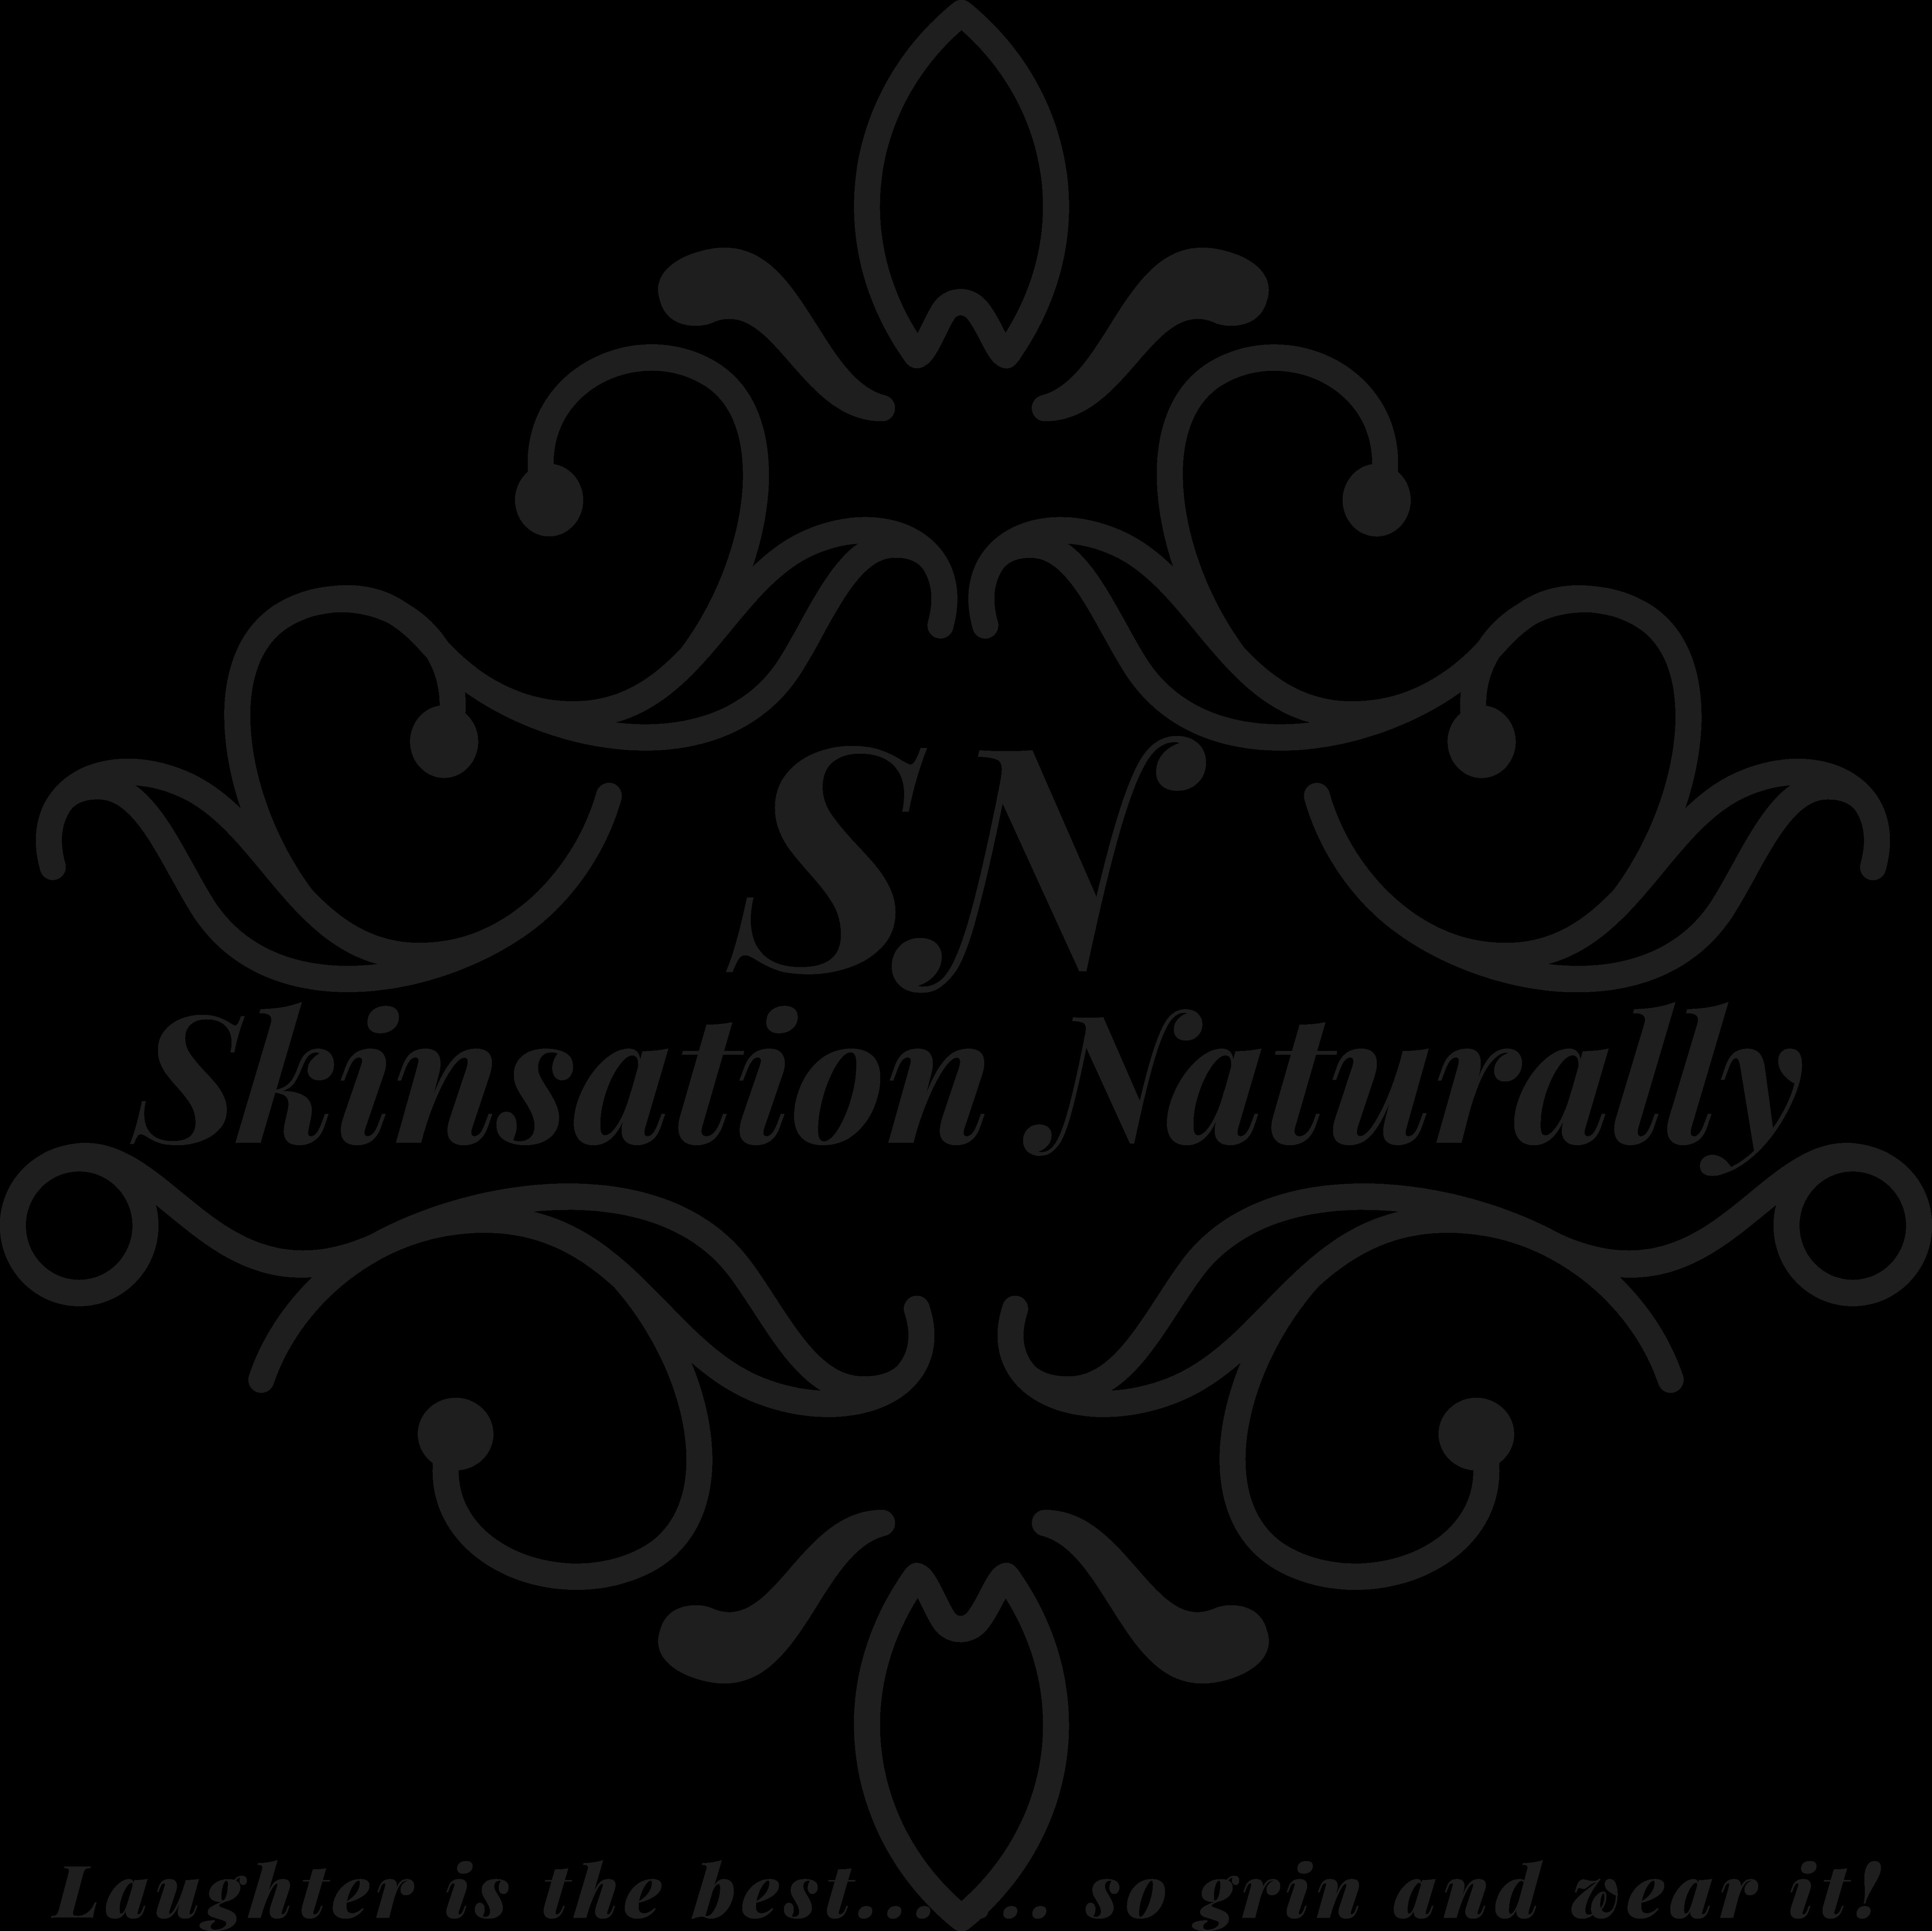 Skinsation Natrually